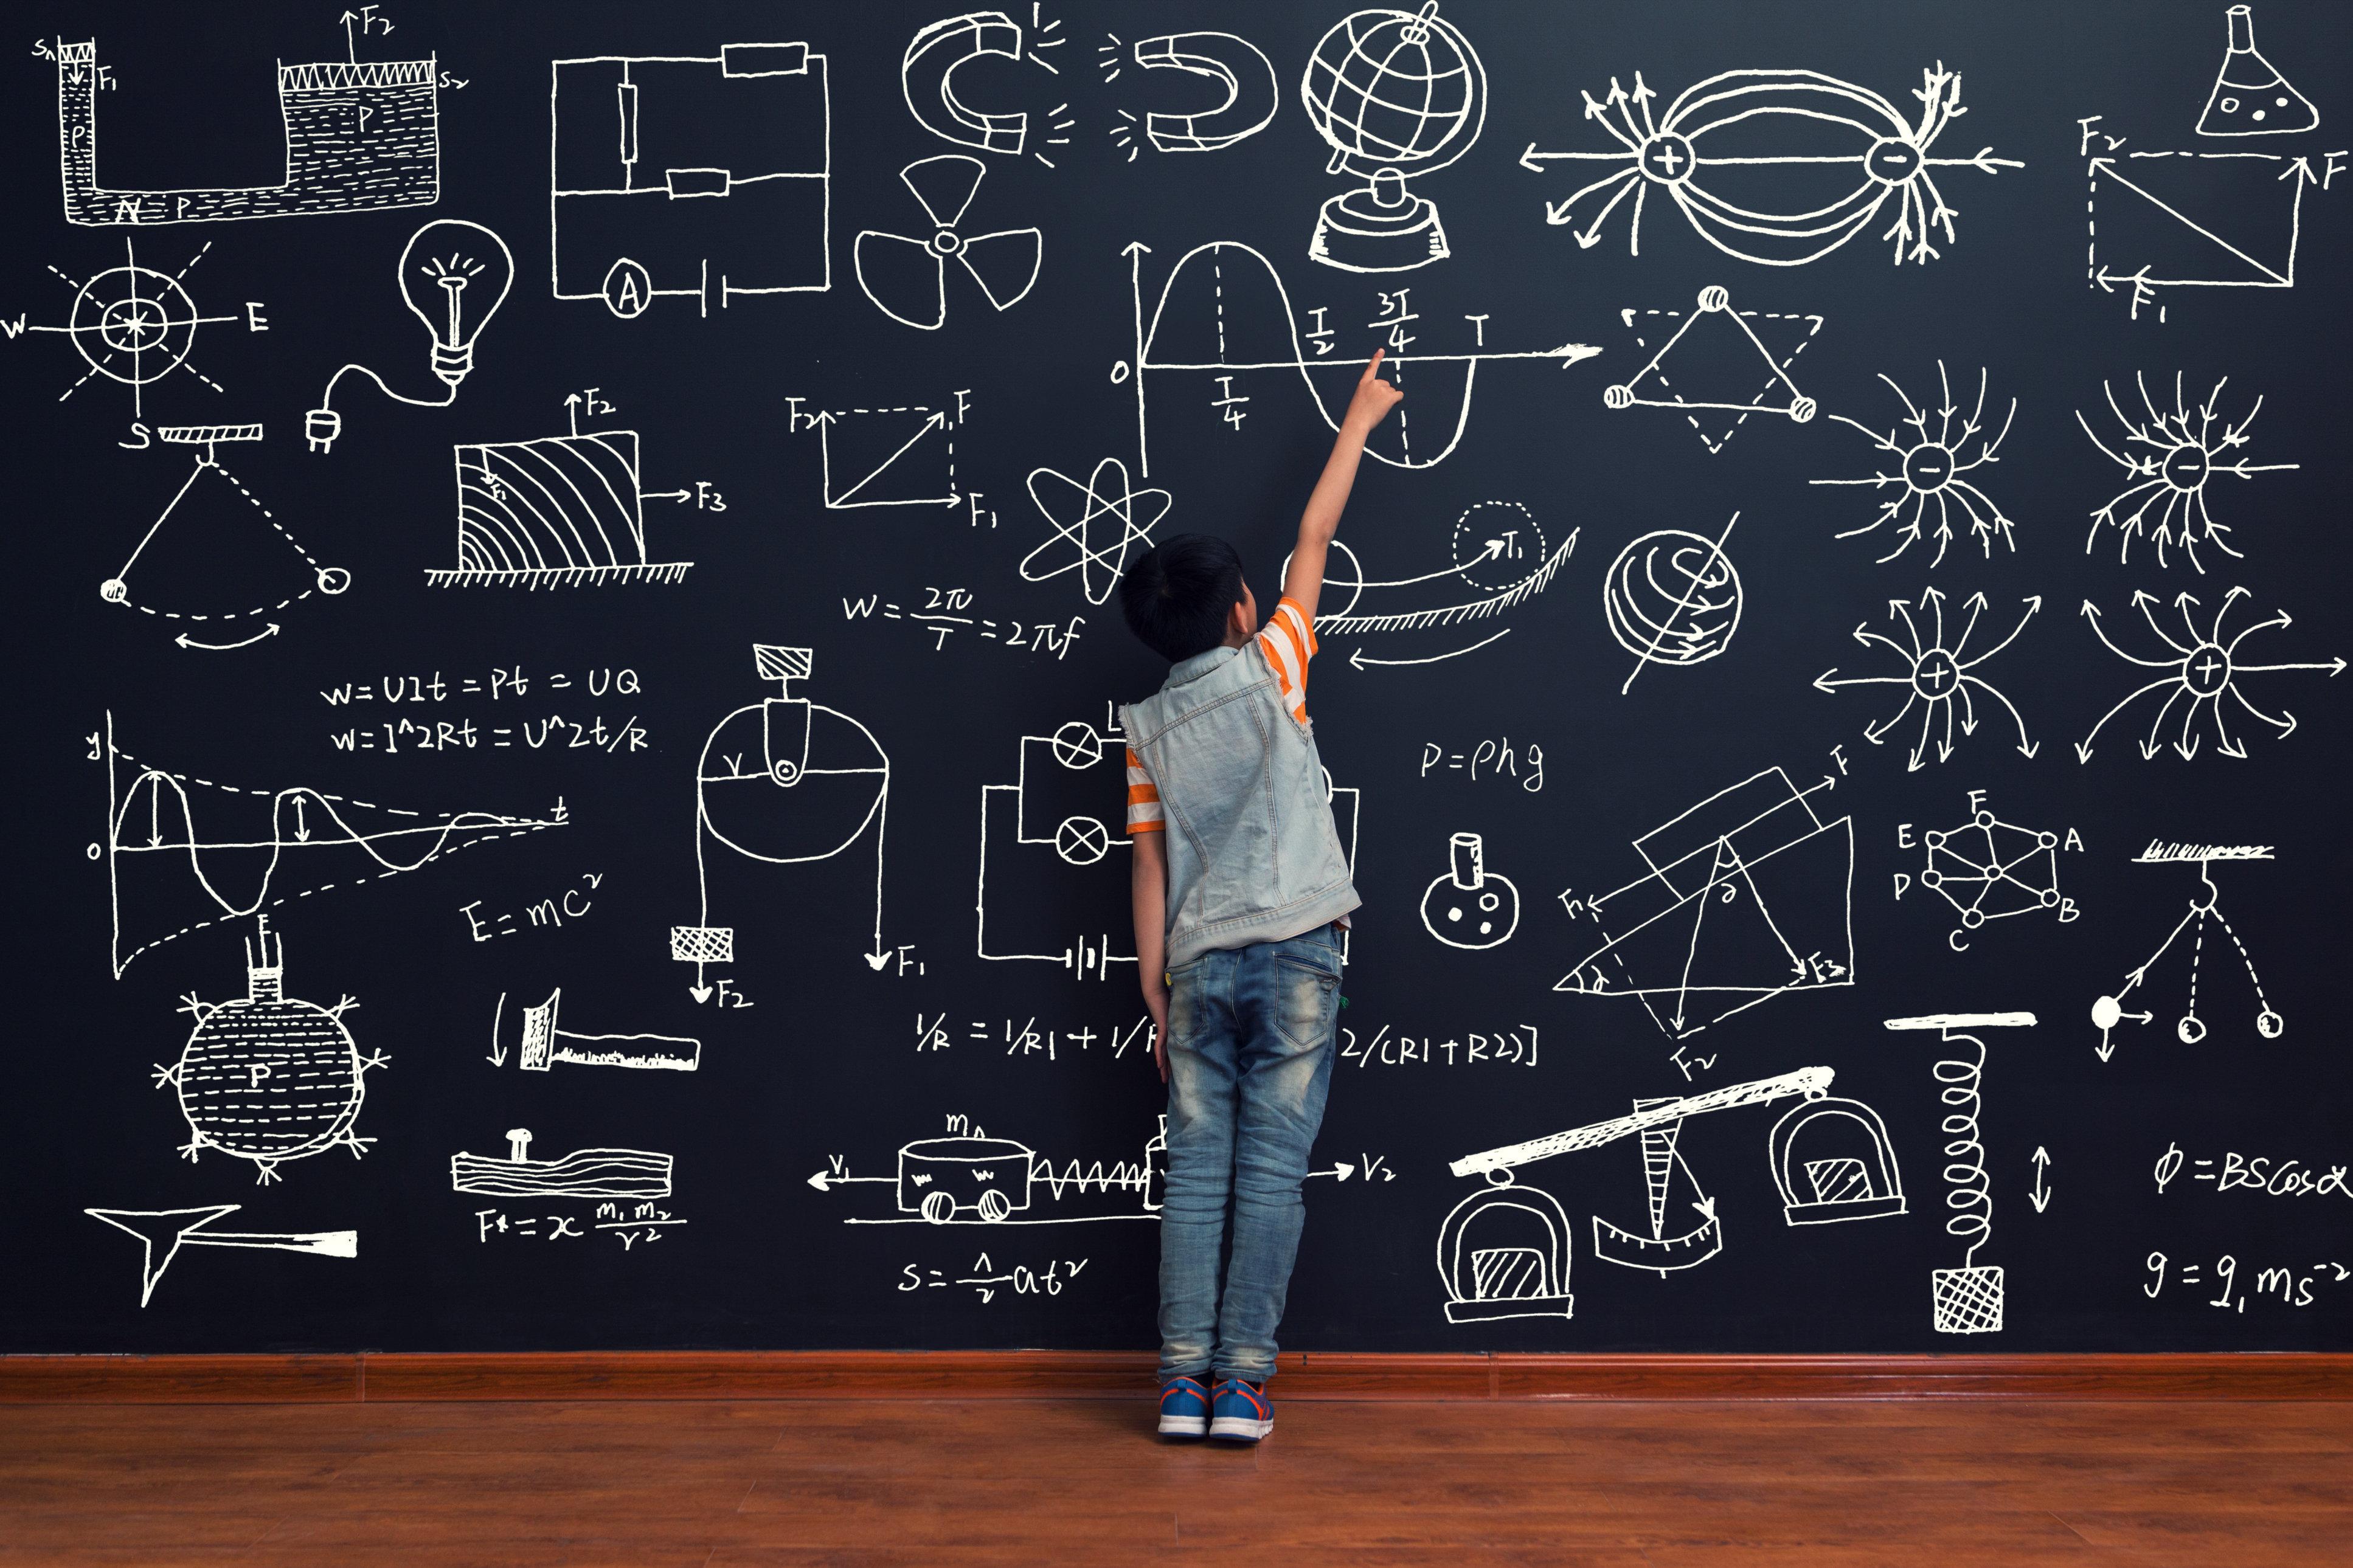 The boy studies in front of the blackboard